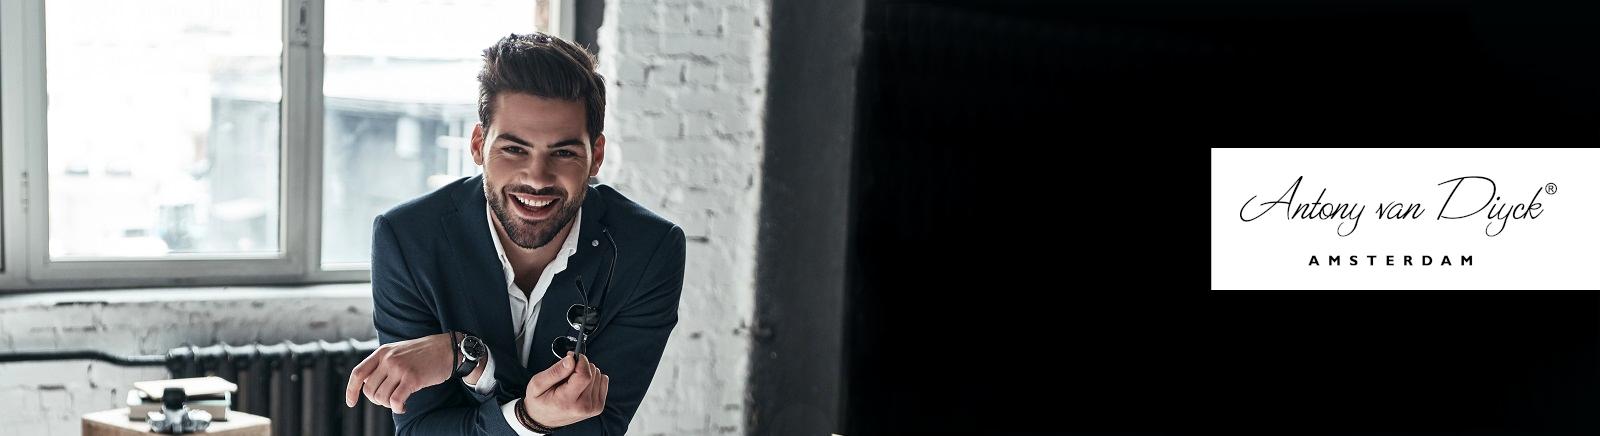 Prange: Antony van Diyck  online shoppen